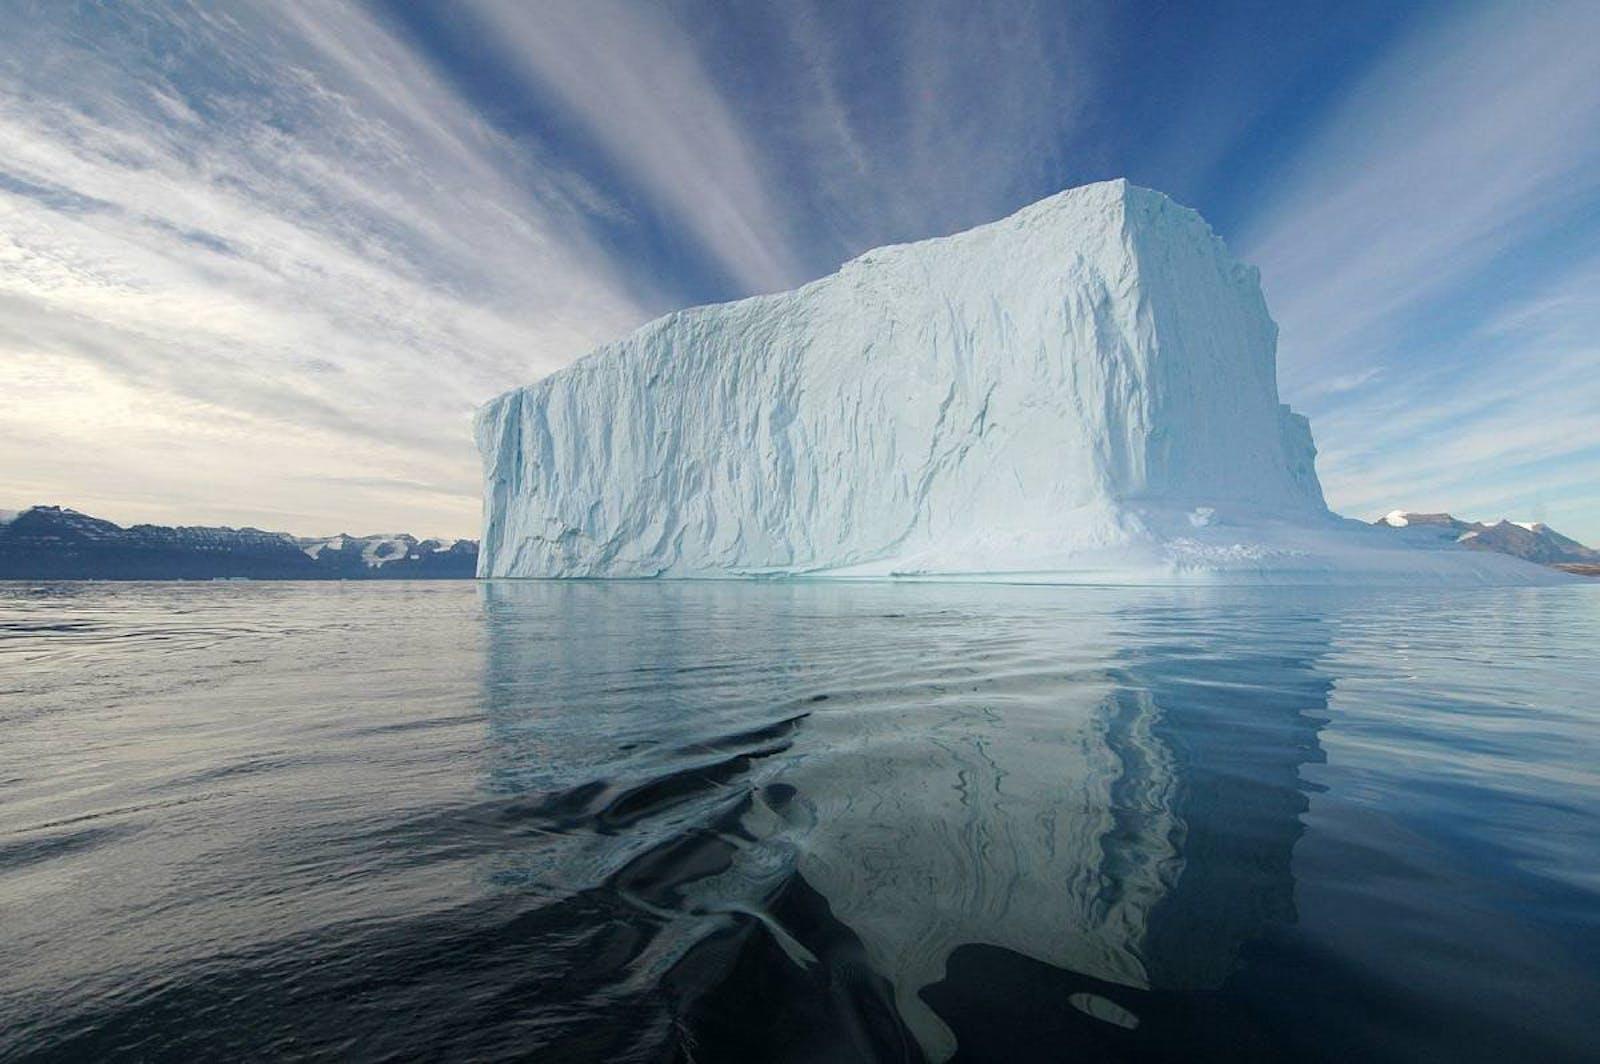 Kalaallit Nunaat High Arctic Tundra